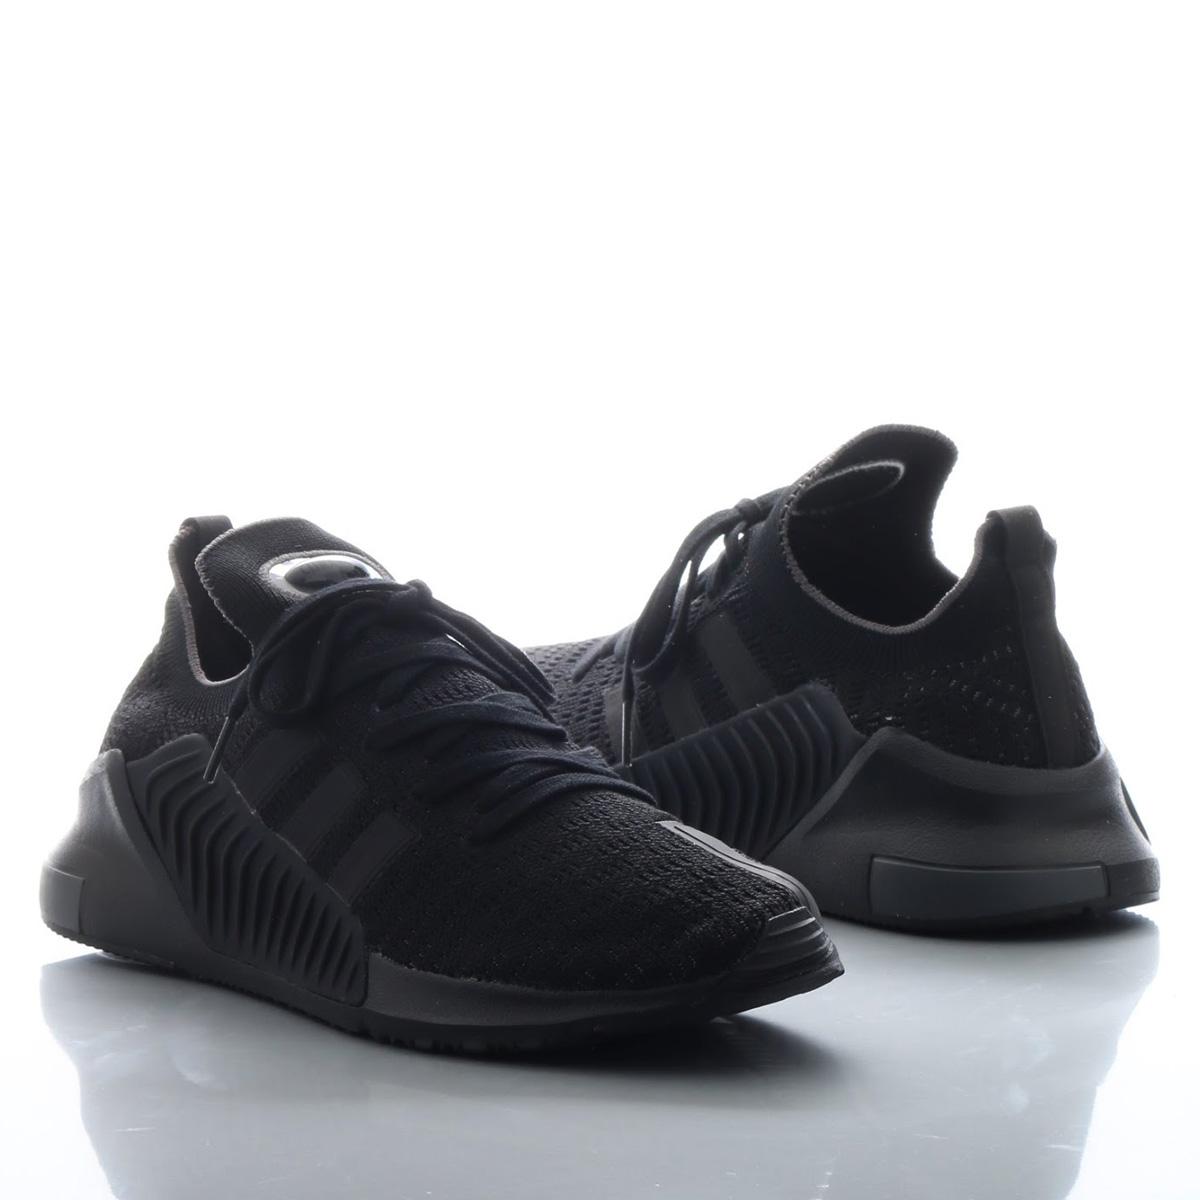 adidas Originals CLIMACOOL 02/17 PK(アディダス オリジナルス クライマクール 02/17 PK)Core Black/Core Black/Grey【メンズ スニーカー】18SS-S